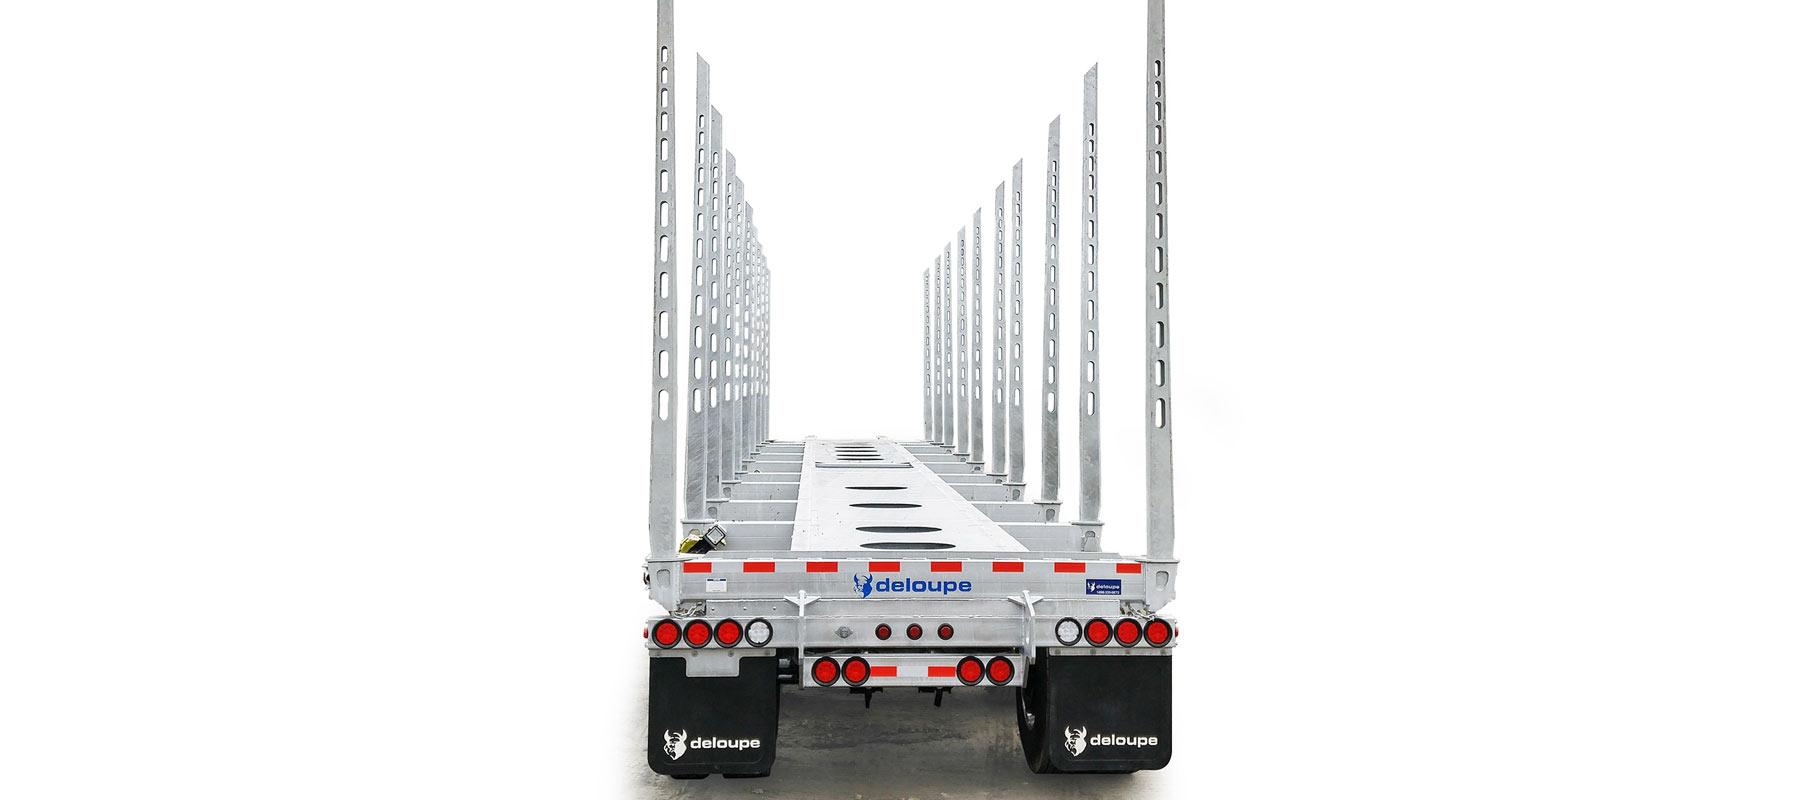 ULTRALIGHT logging trailers back